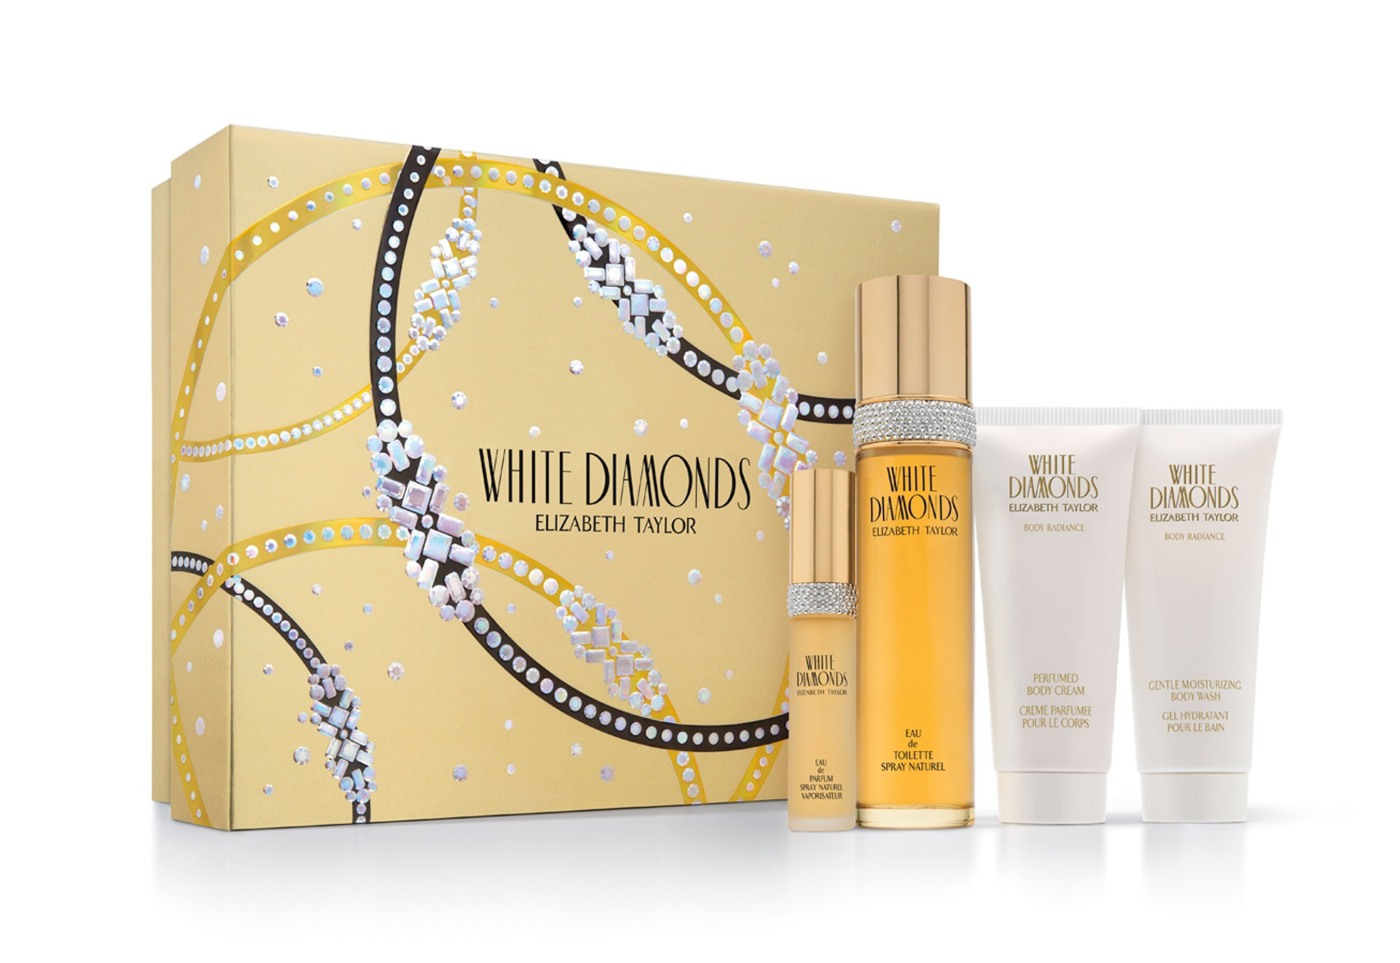 Taylor Gift: Scentsational White Diamonds Elizabeth Taylor Gifts